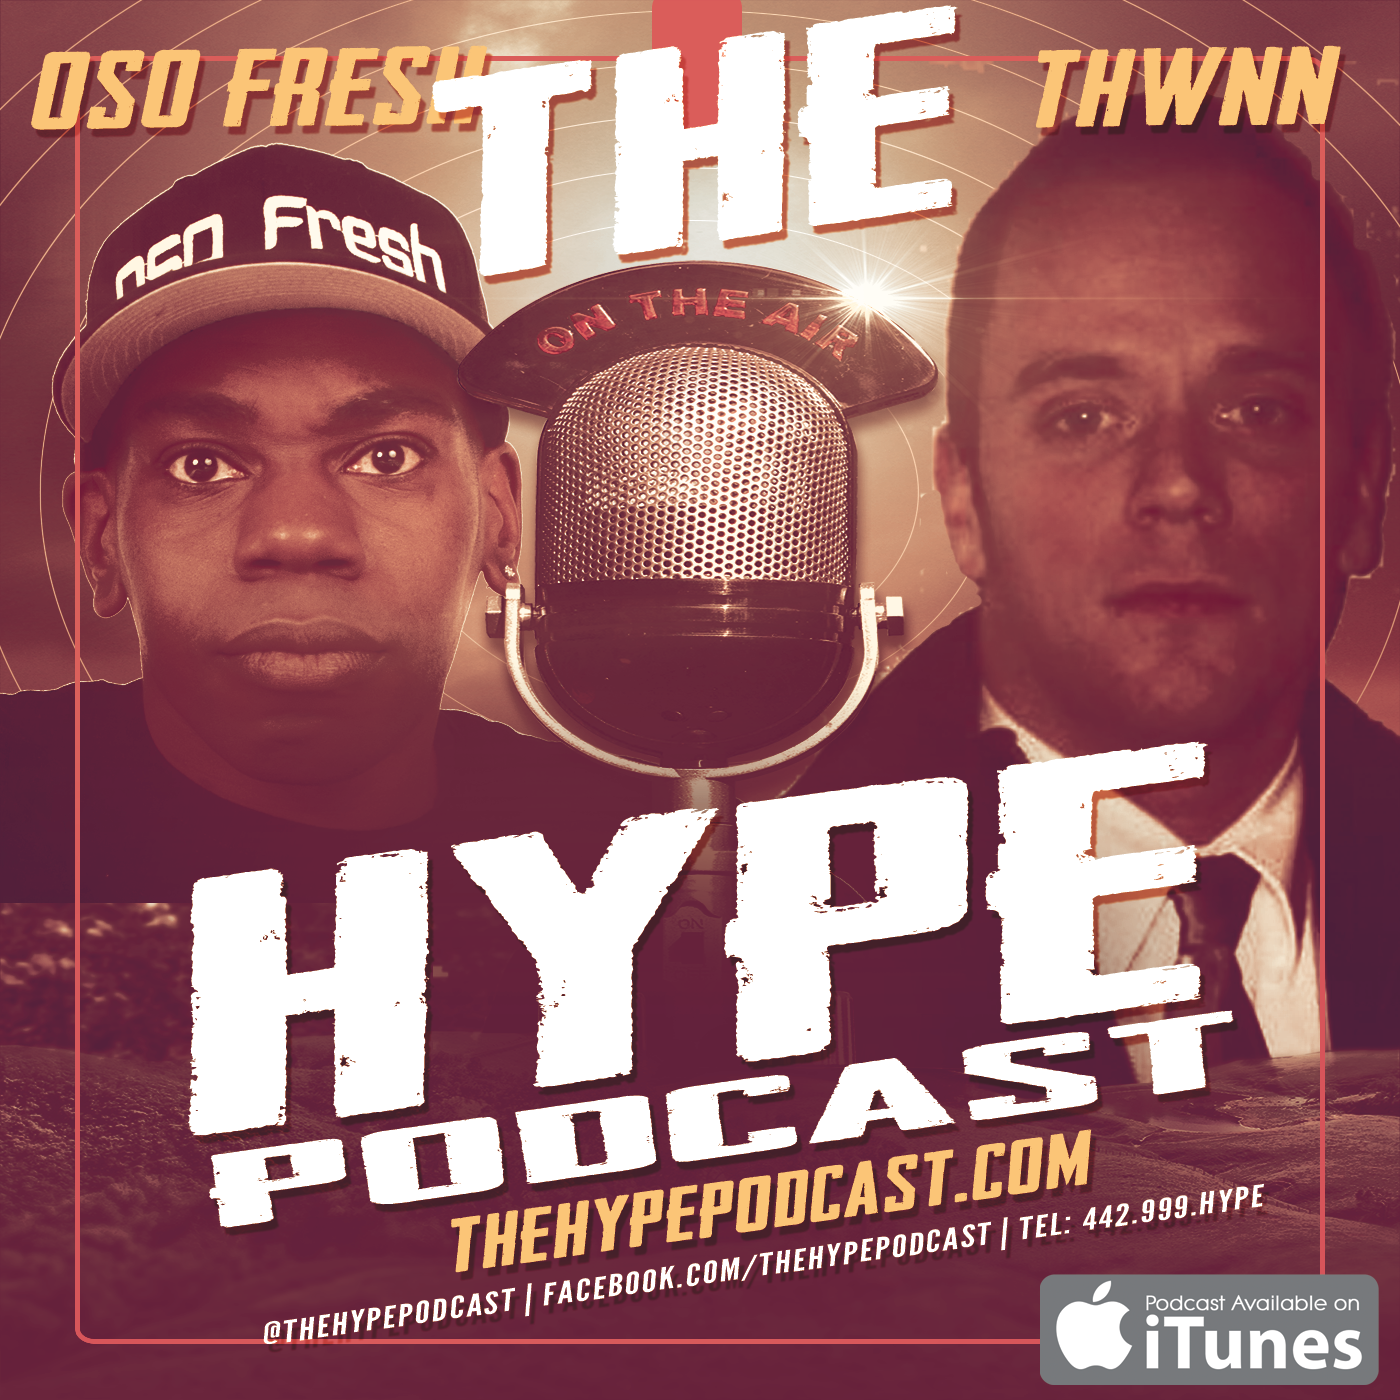 Artwork for hype podcast episode 1004